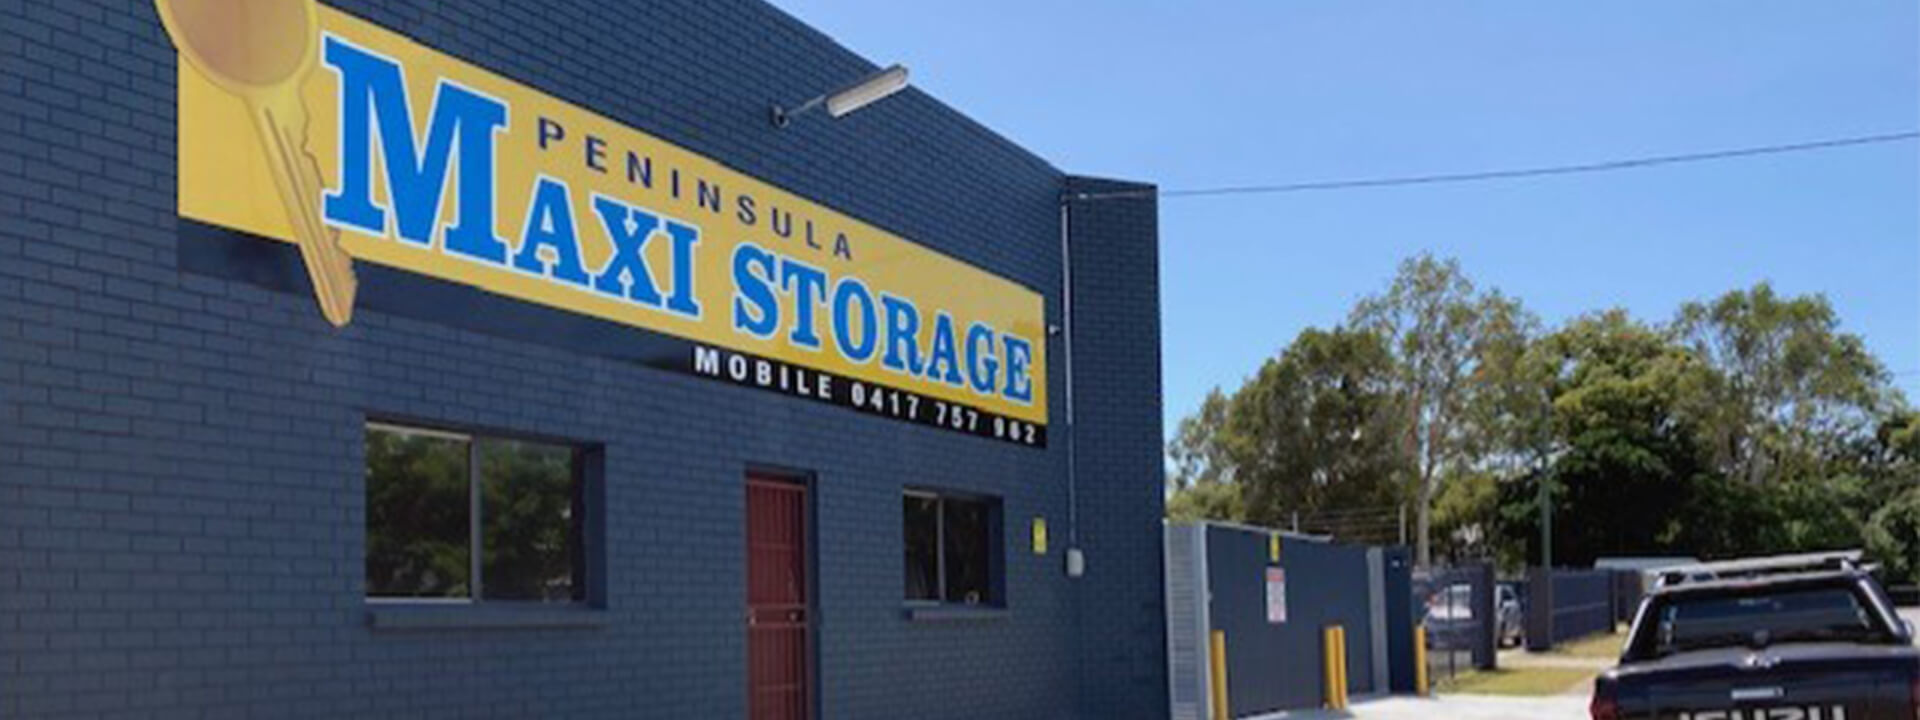 Peninsula Maxi Storage - storage units for Kippa-Ring, Redcliffe, North Lakes & North Brisbane area